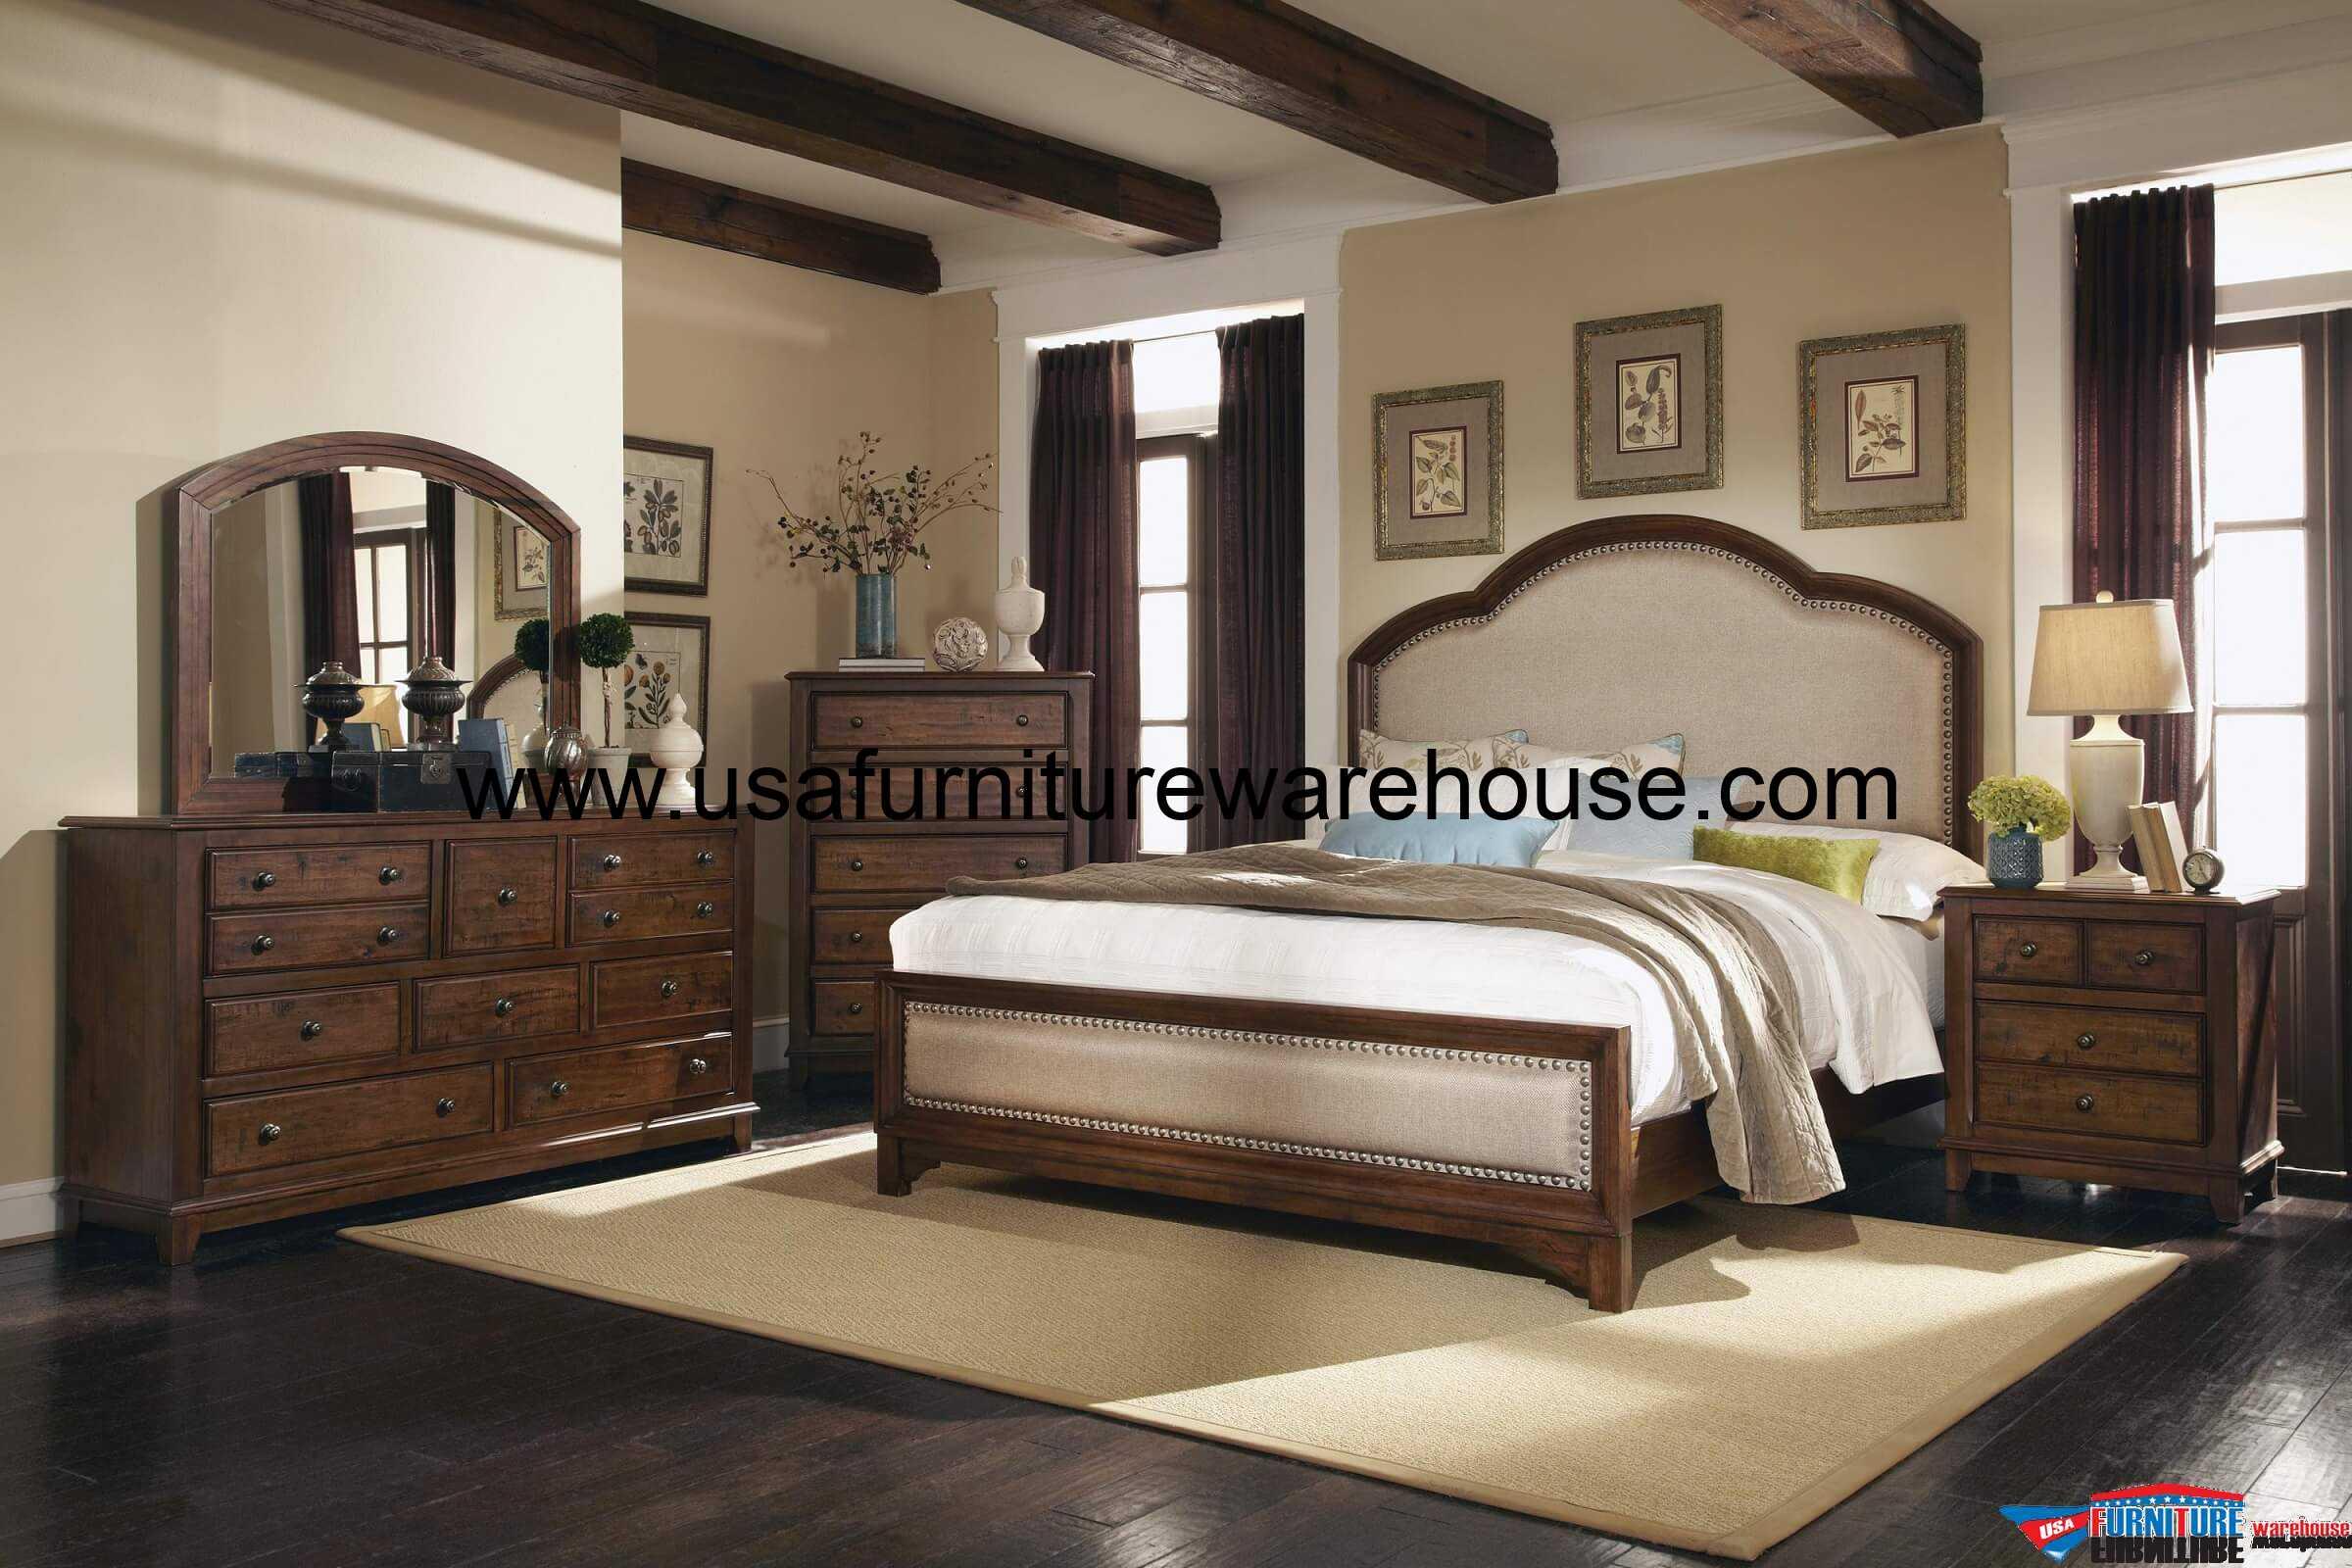 Coaster Furniture 4-Pc Laughton Upholstered Distress